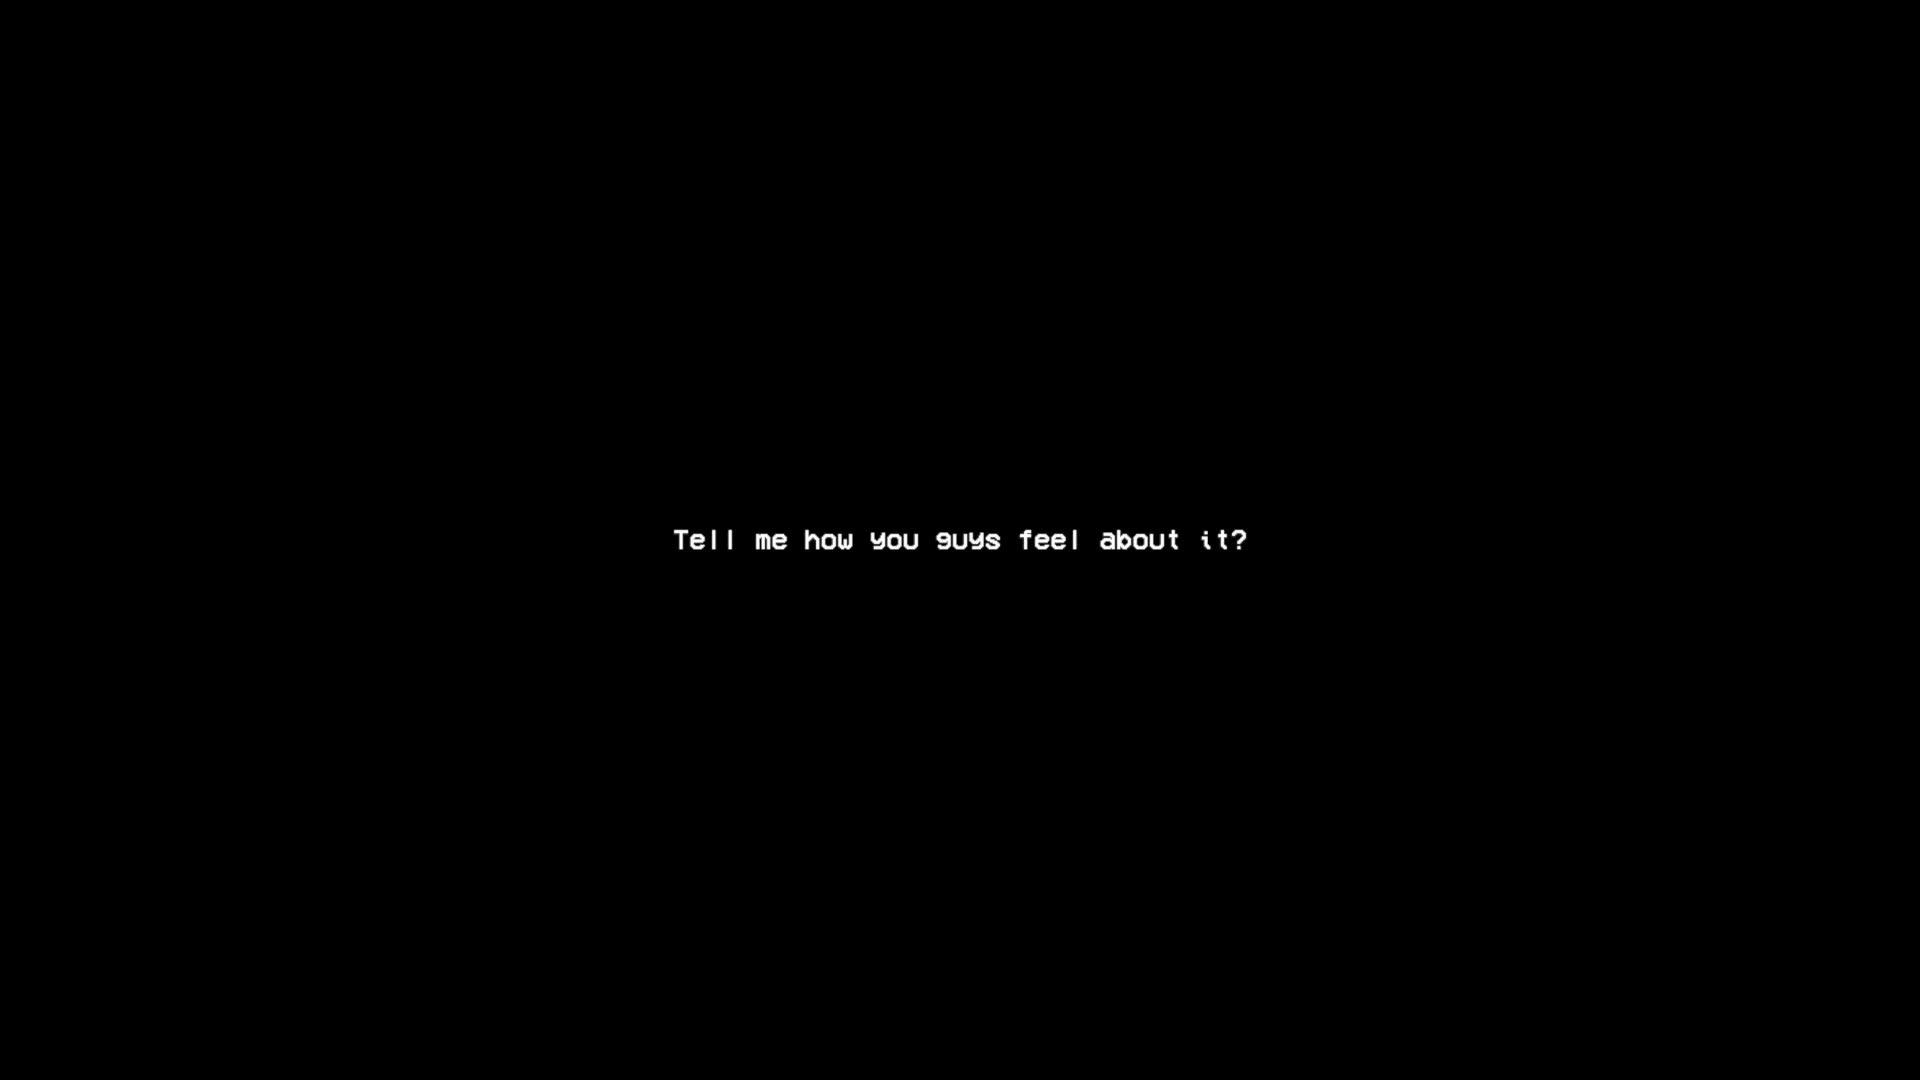 STAYC(스테이씨) Spoiler Teaser #2